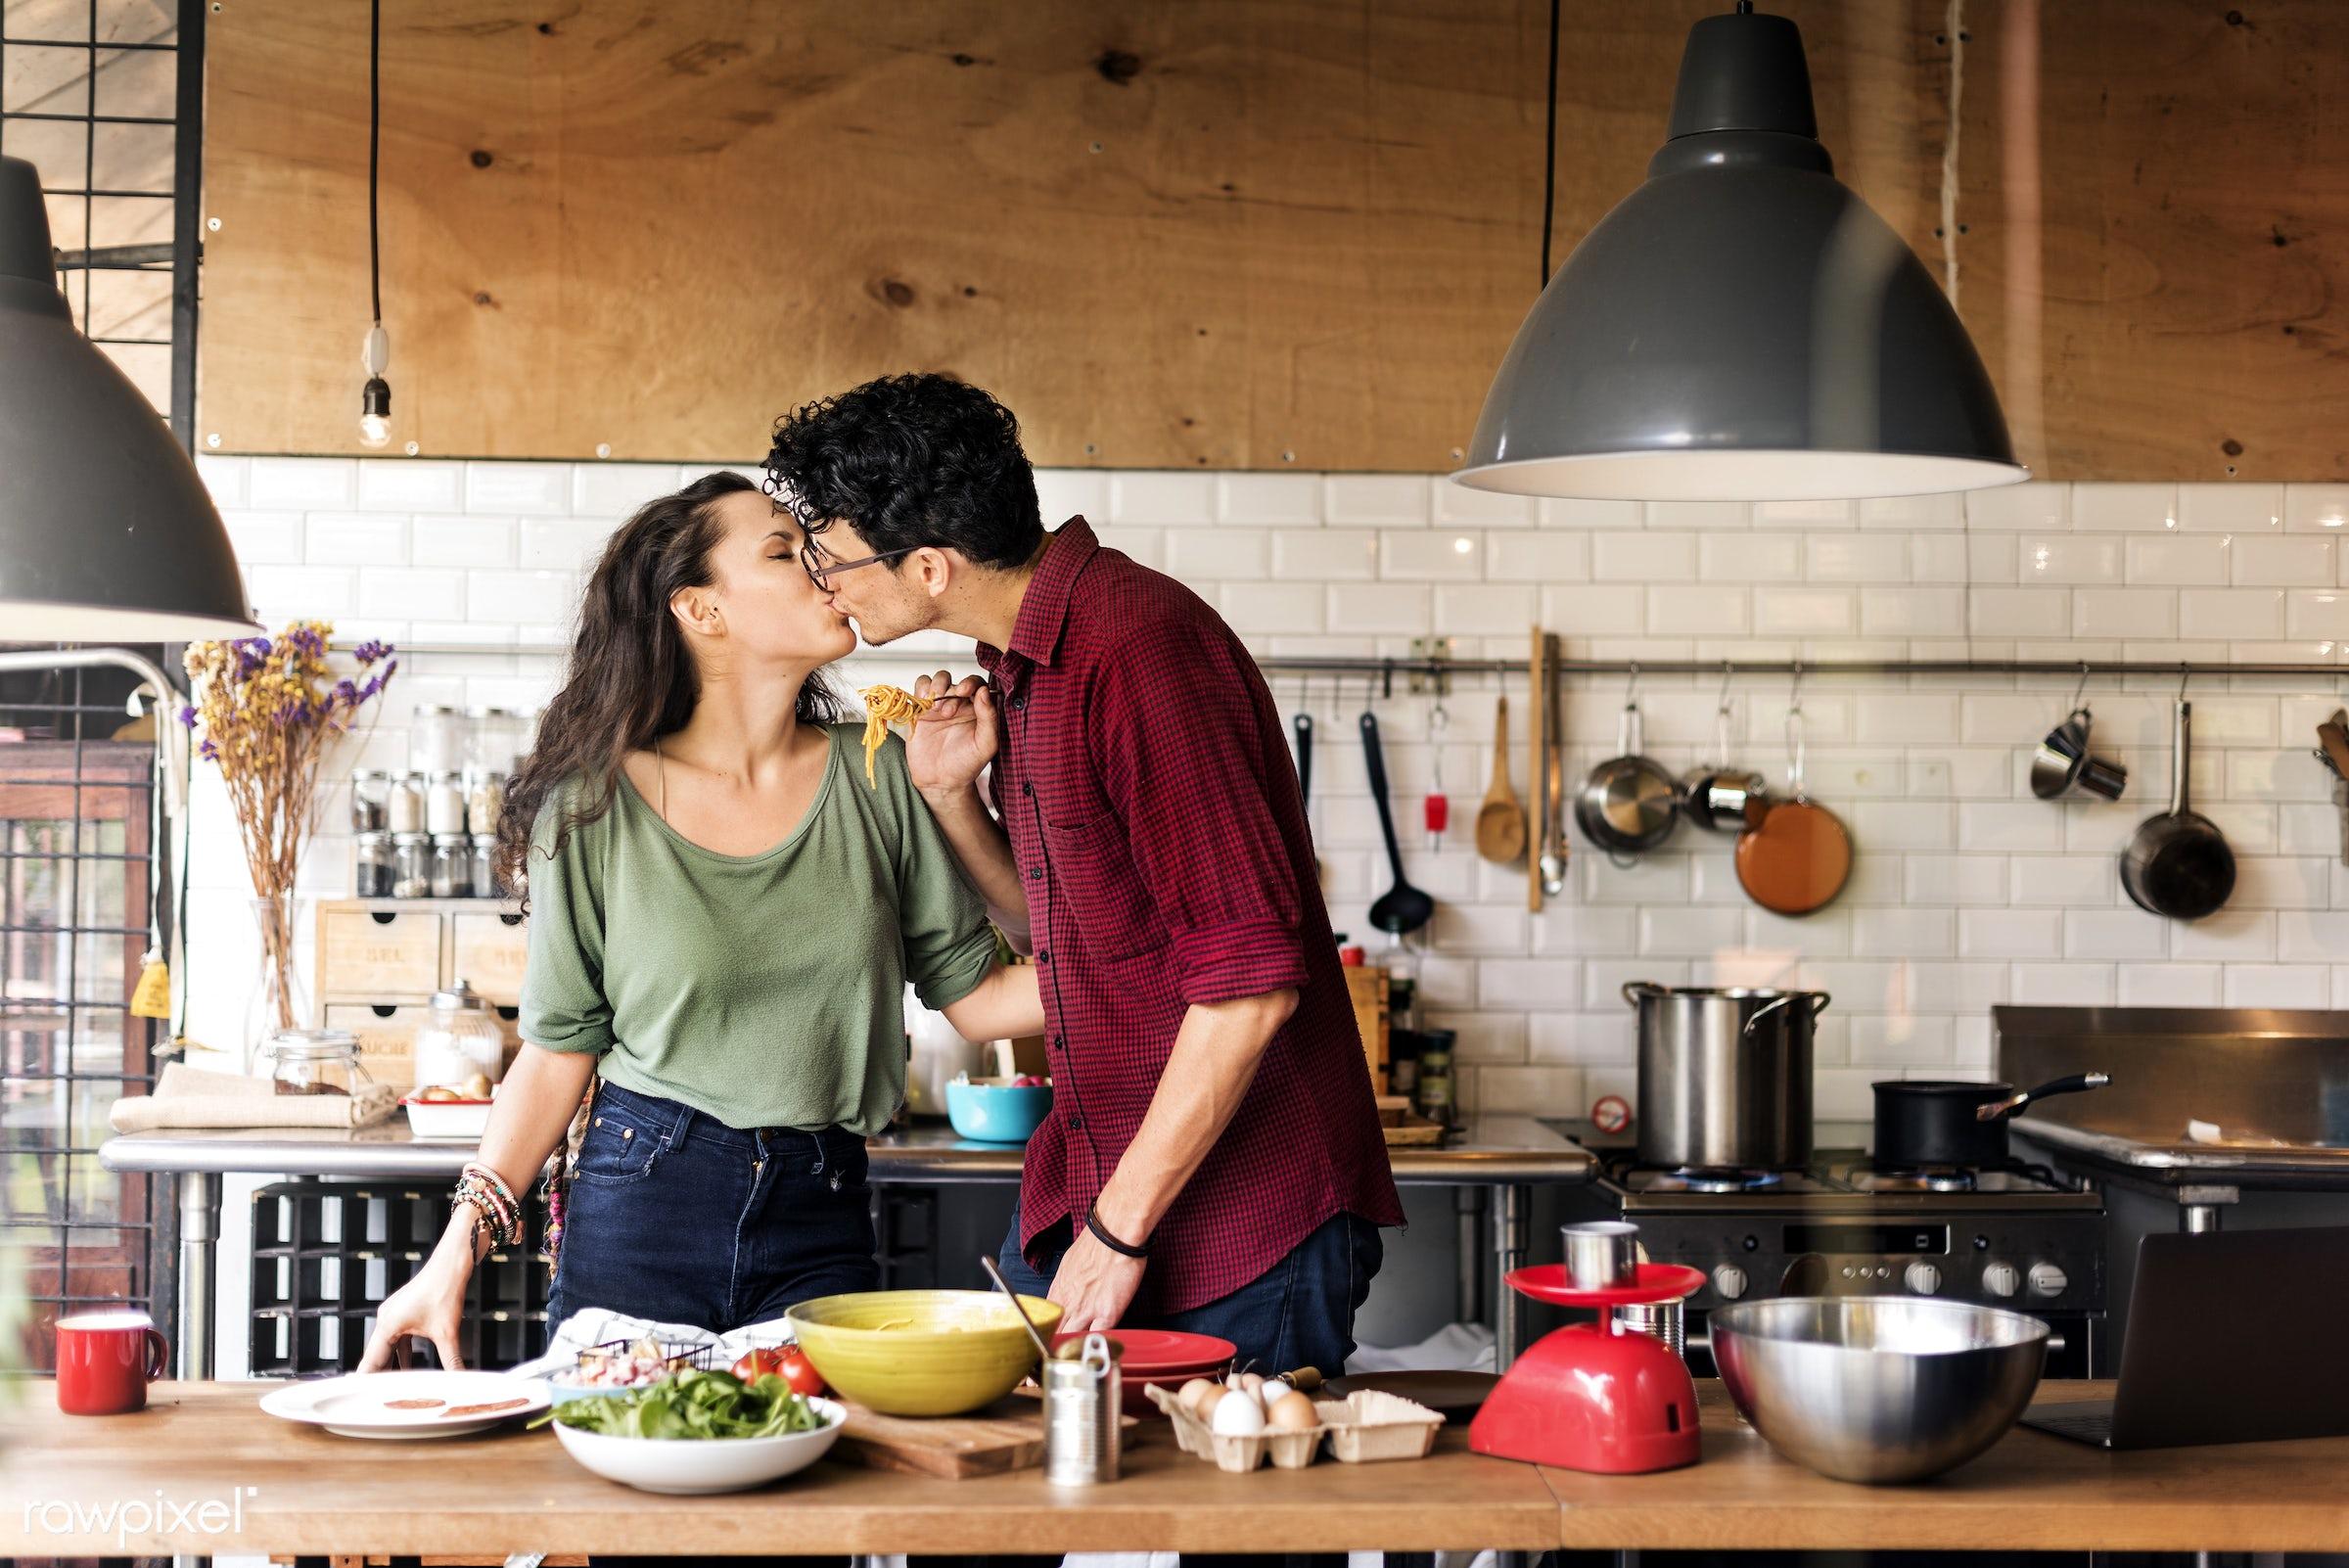 equipment, kiss, activity, apples, bonding, boyfriend, breakfast, casual, cheerful, couple, cuisine, culinary, dietary,...